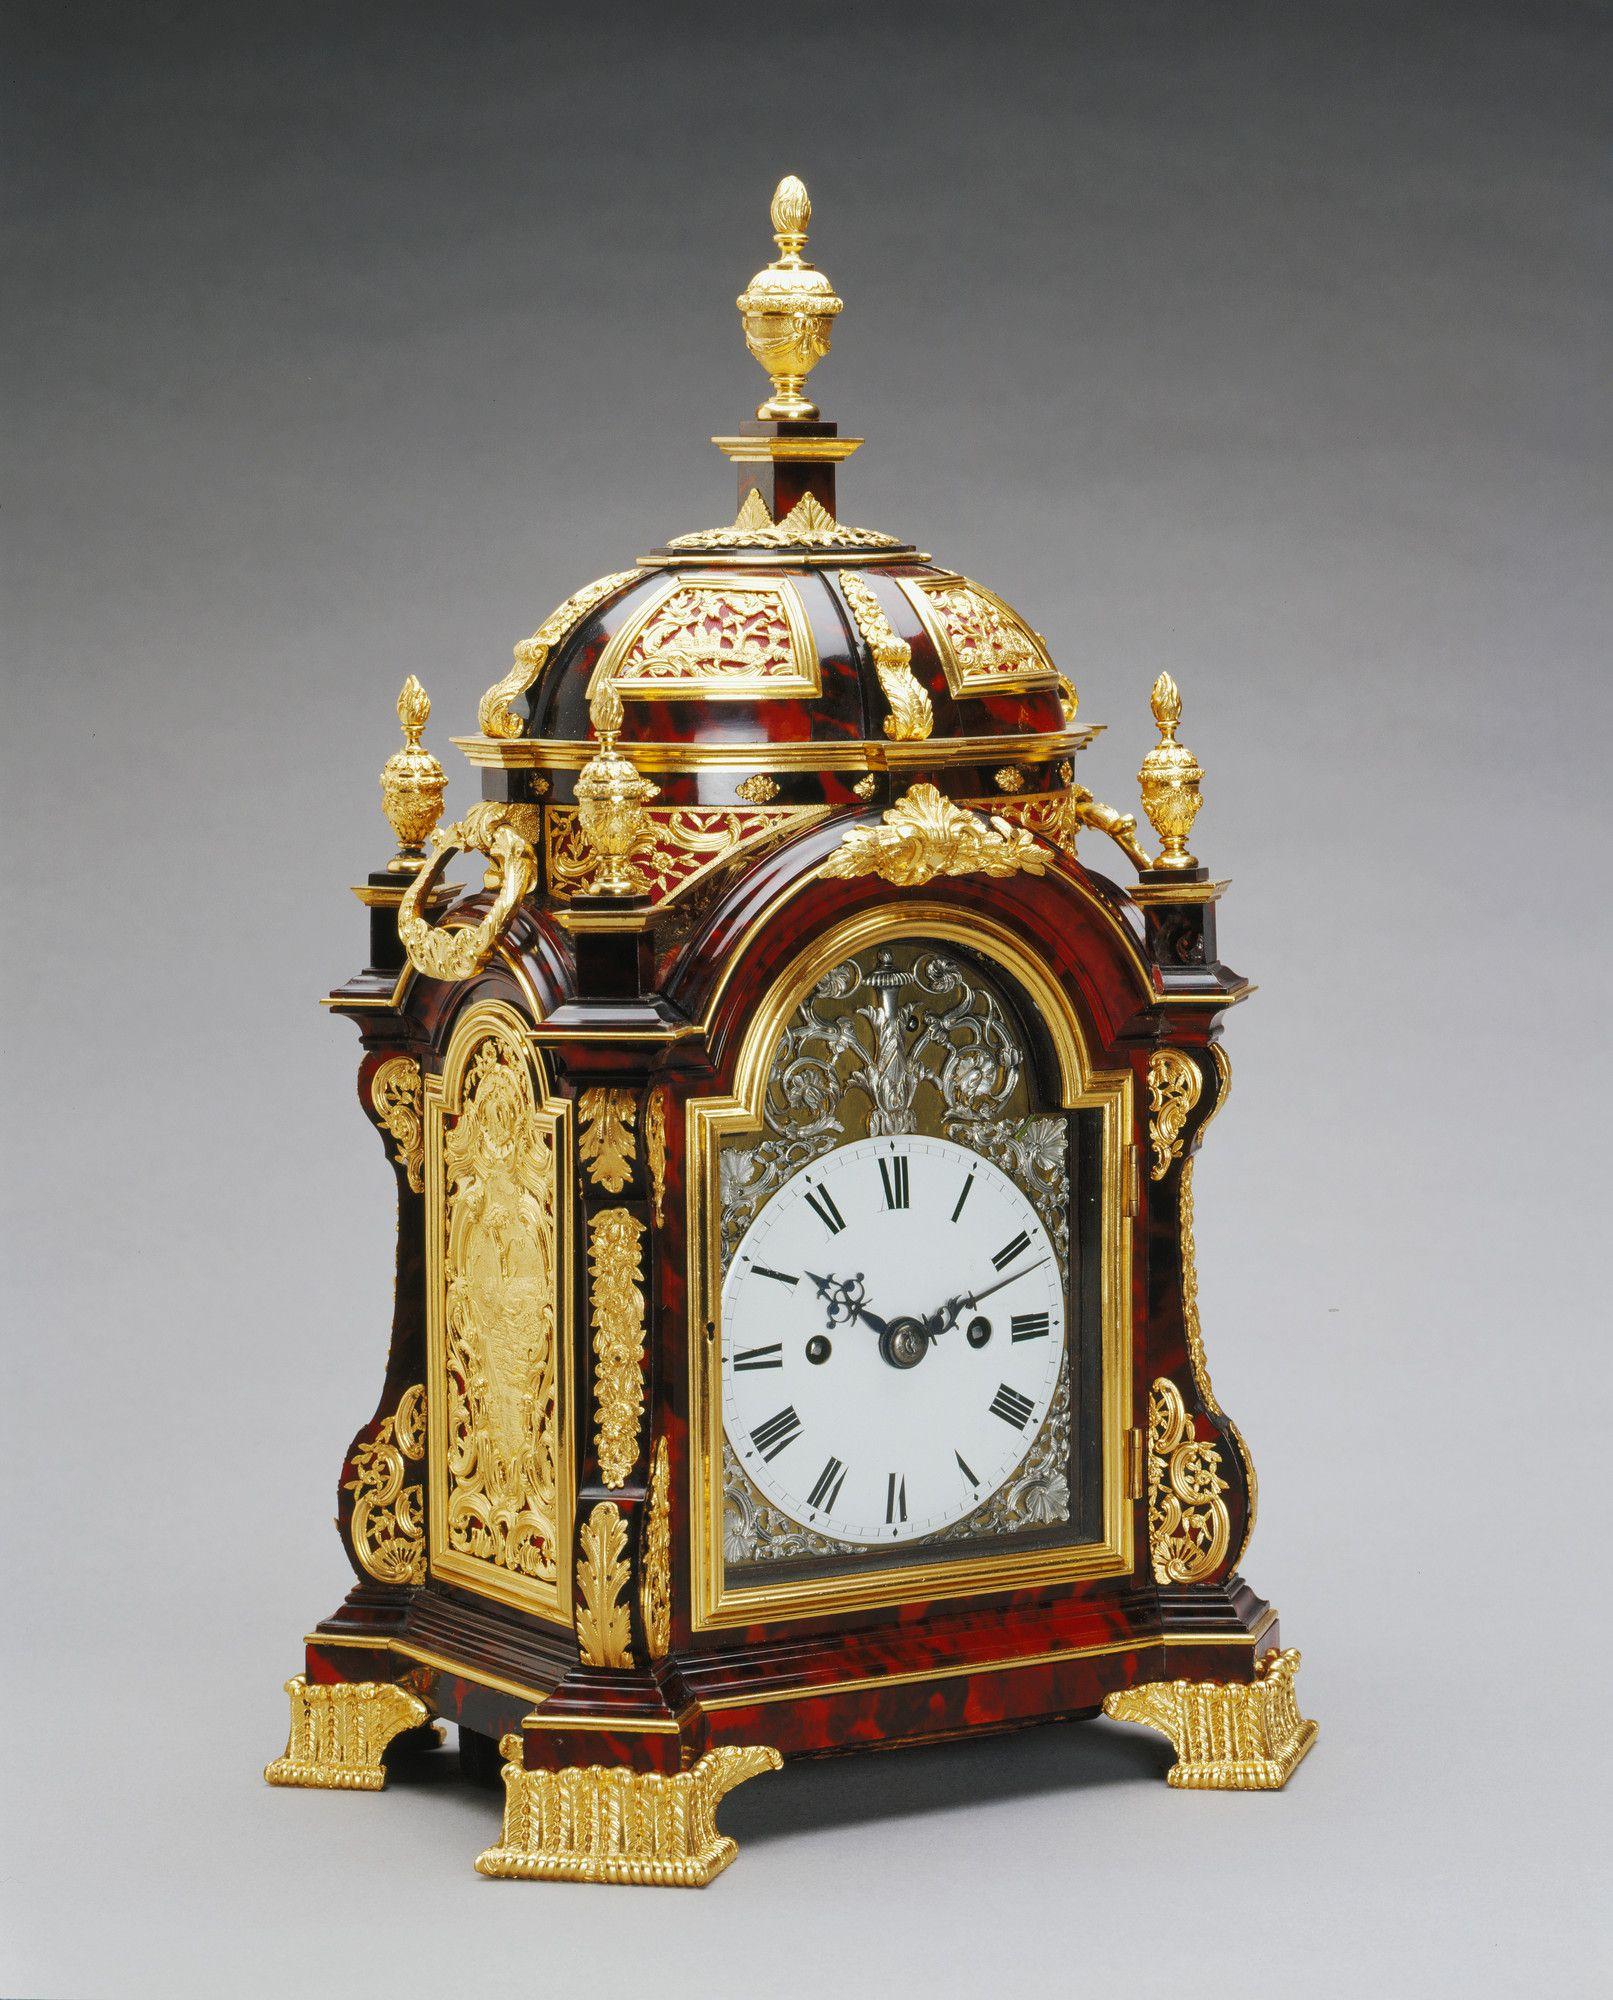 This elaborately mounted tortoiseshellveneered clock is comparable